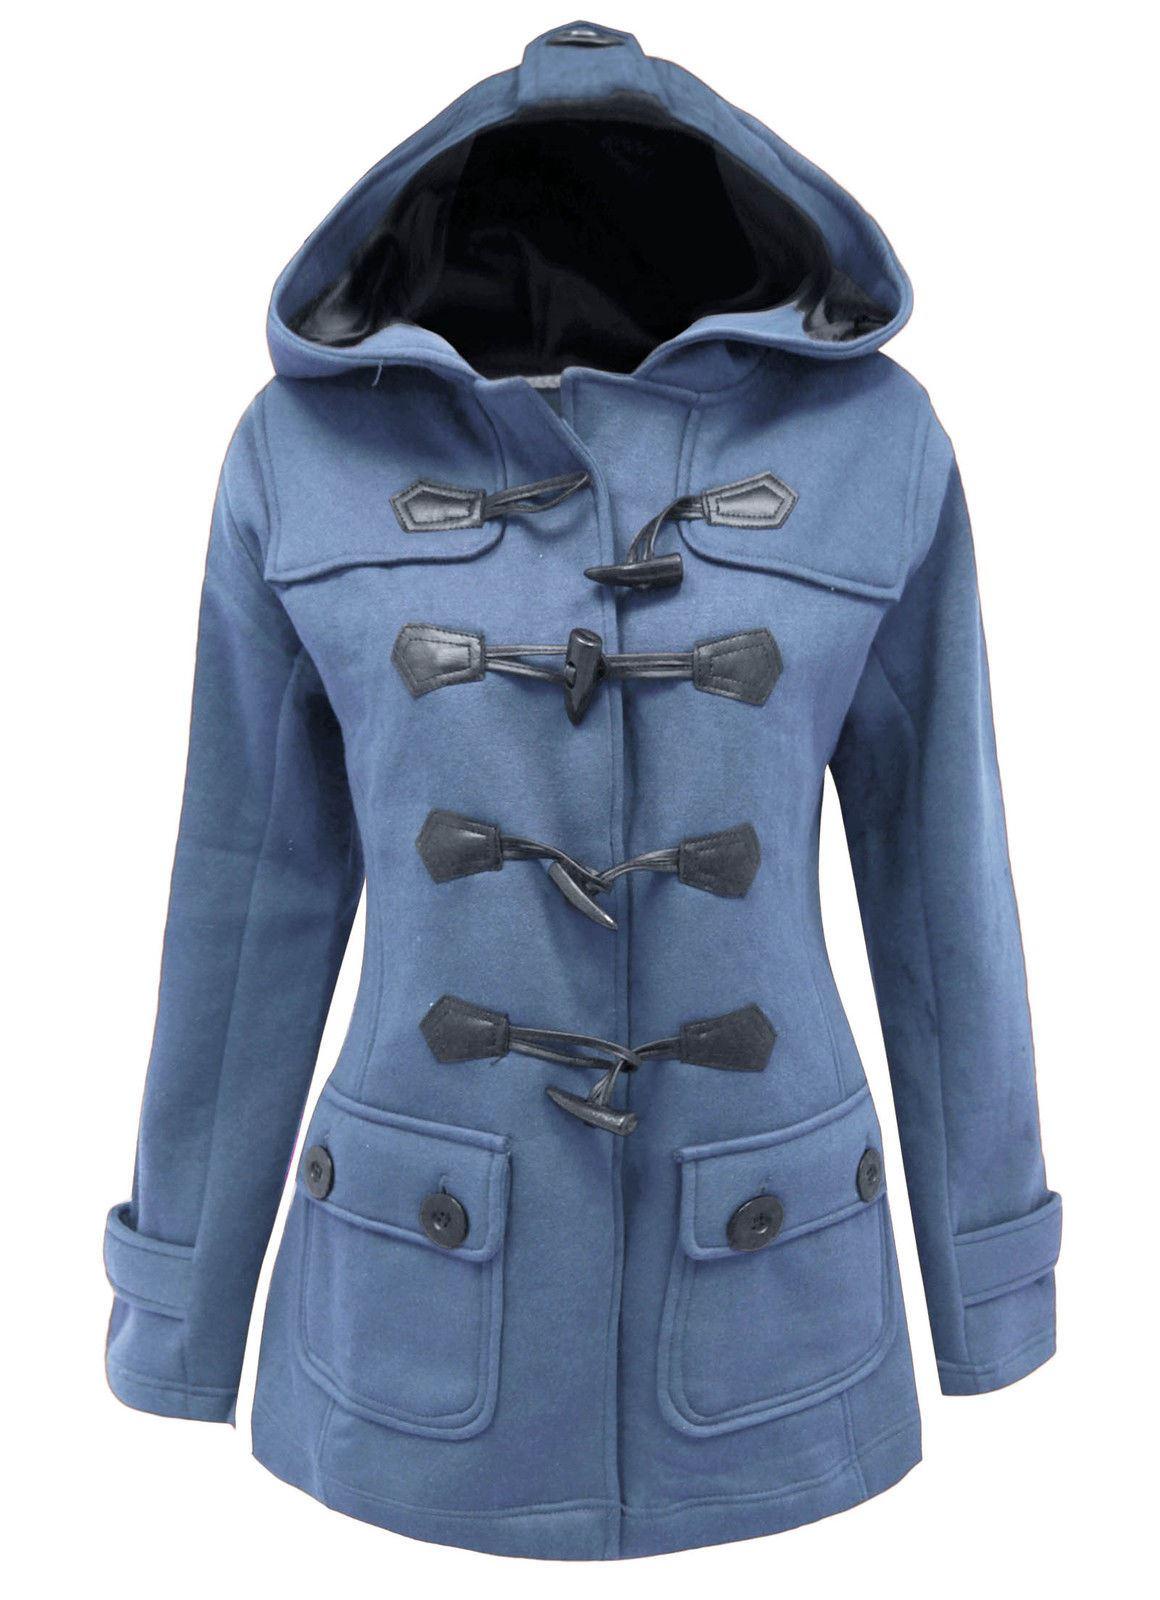 Womens duffle jacket